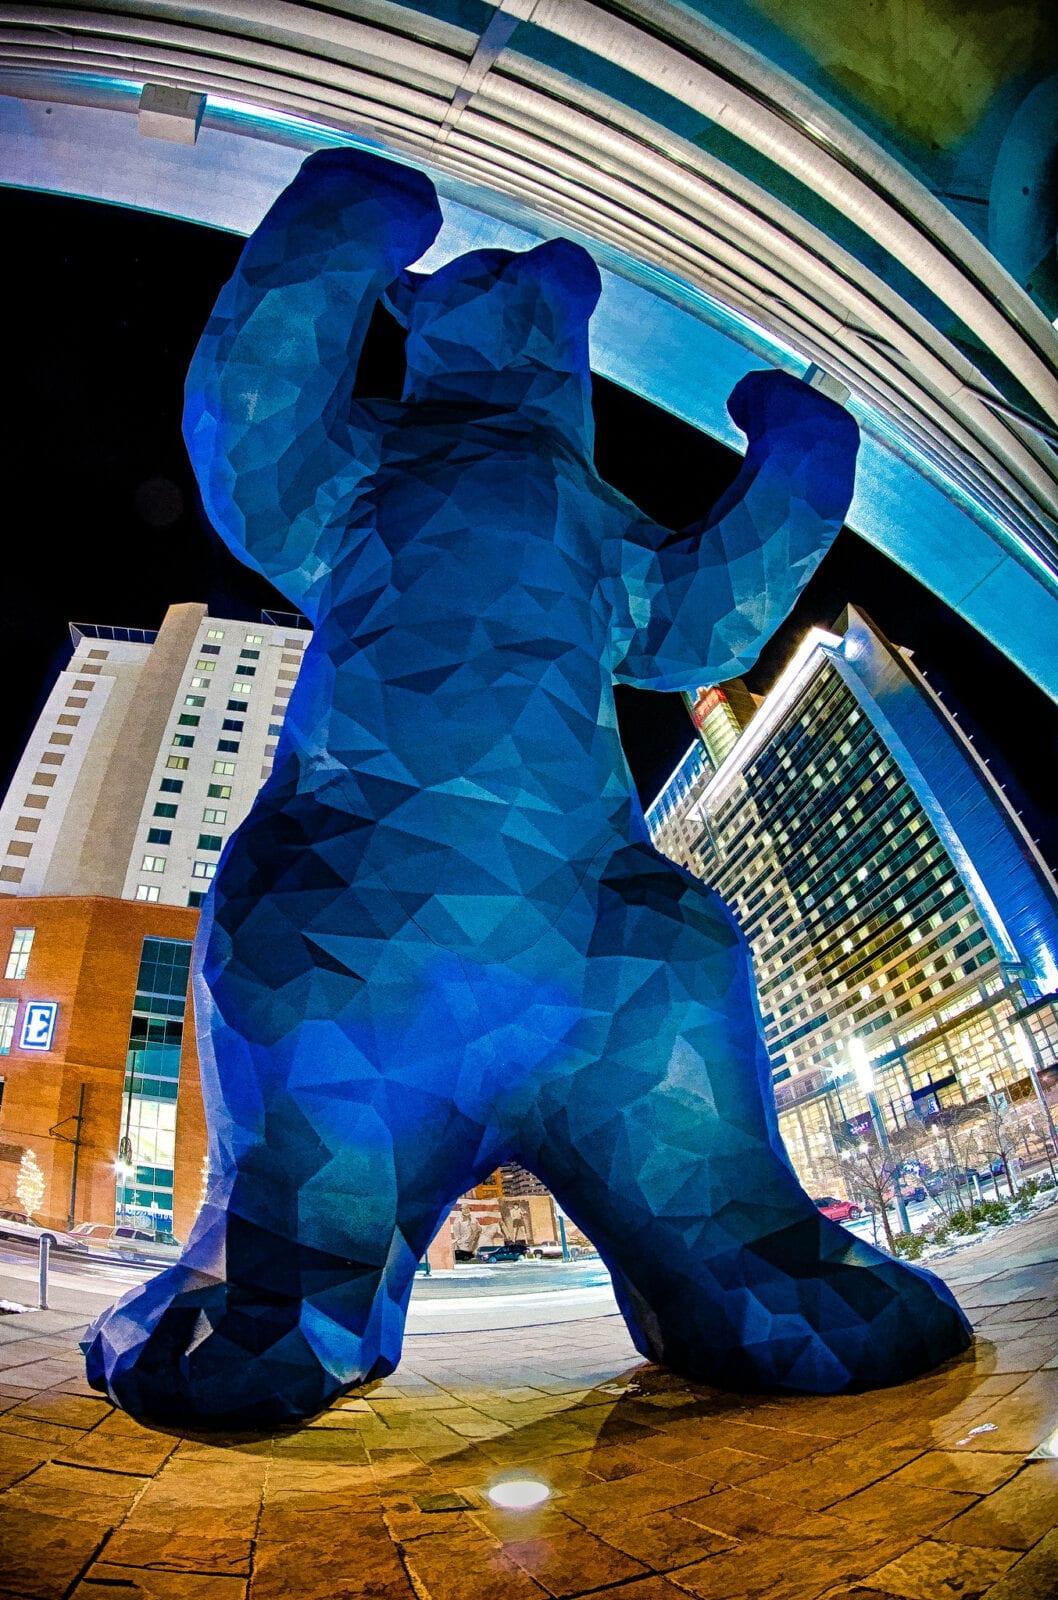 image of the big blue bear